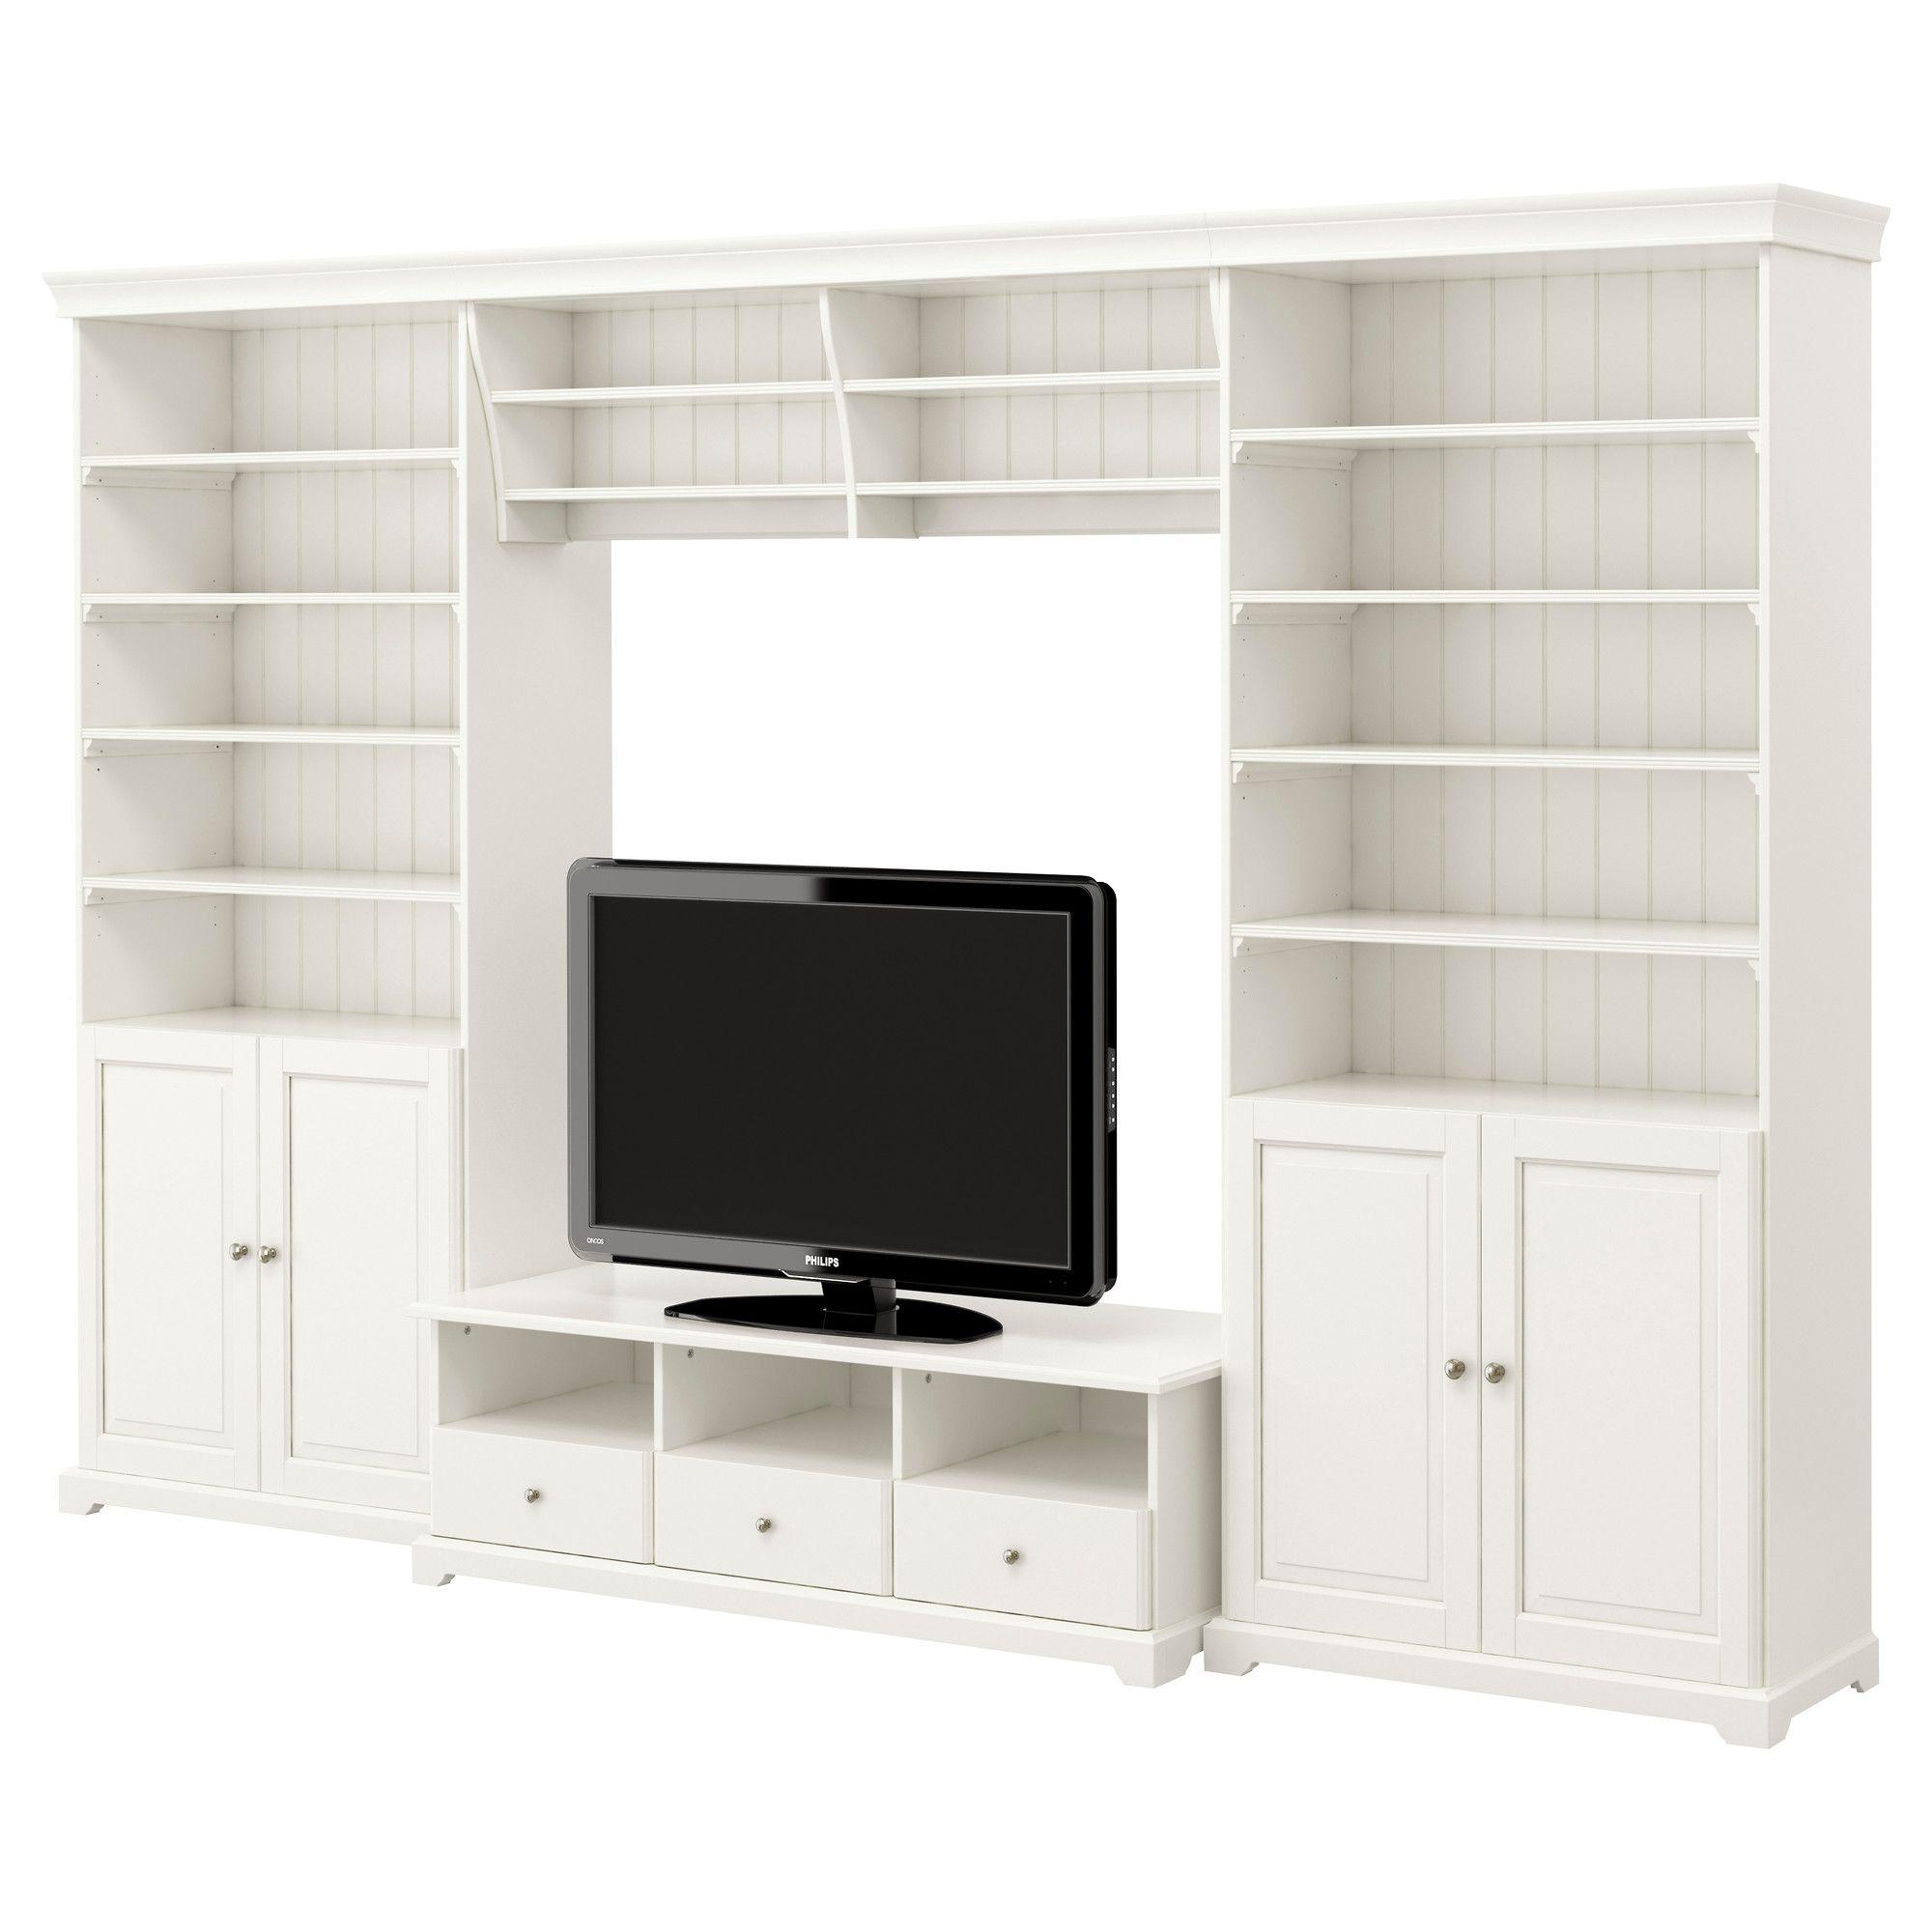 Furniture And Home Furnishings Home Stuff Living Room